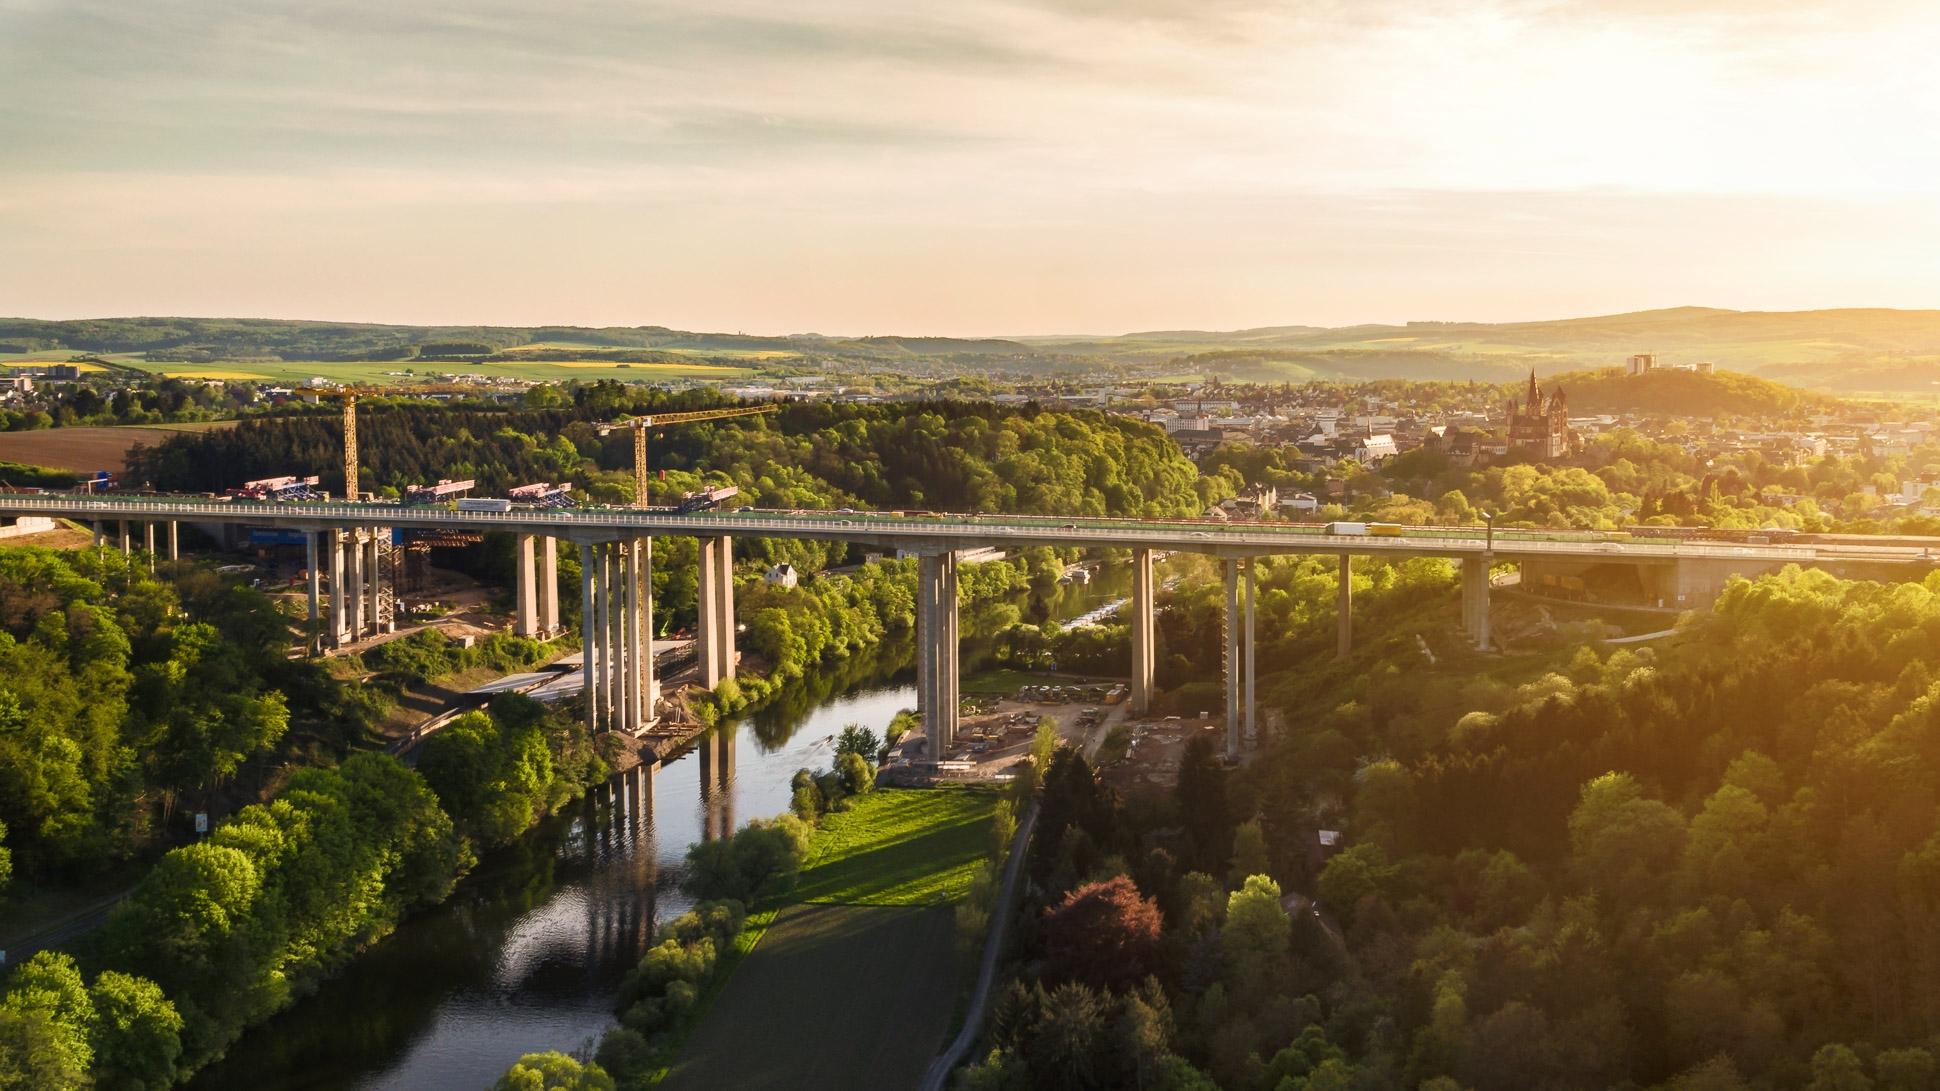 Luftbild Alte & Neue Lahntalbrücke Limburg